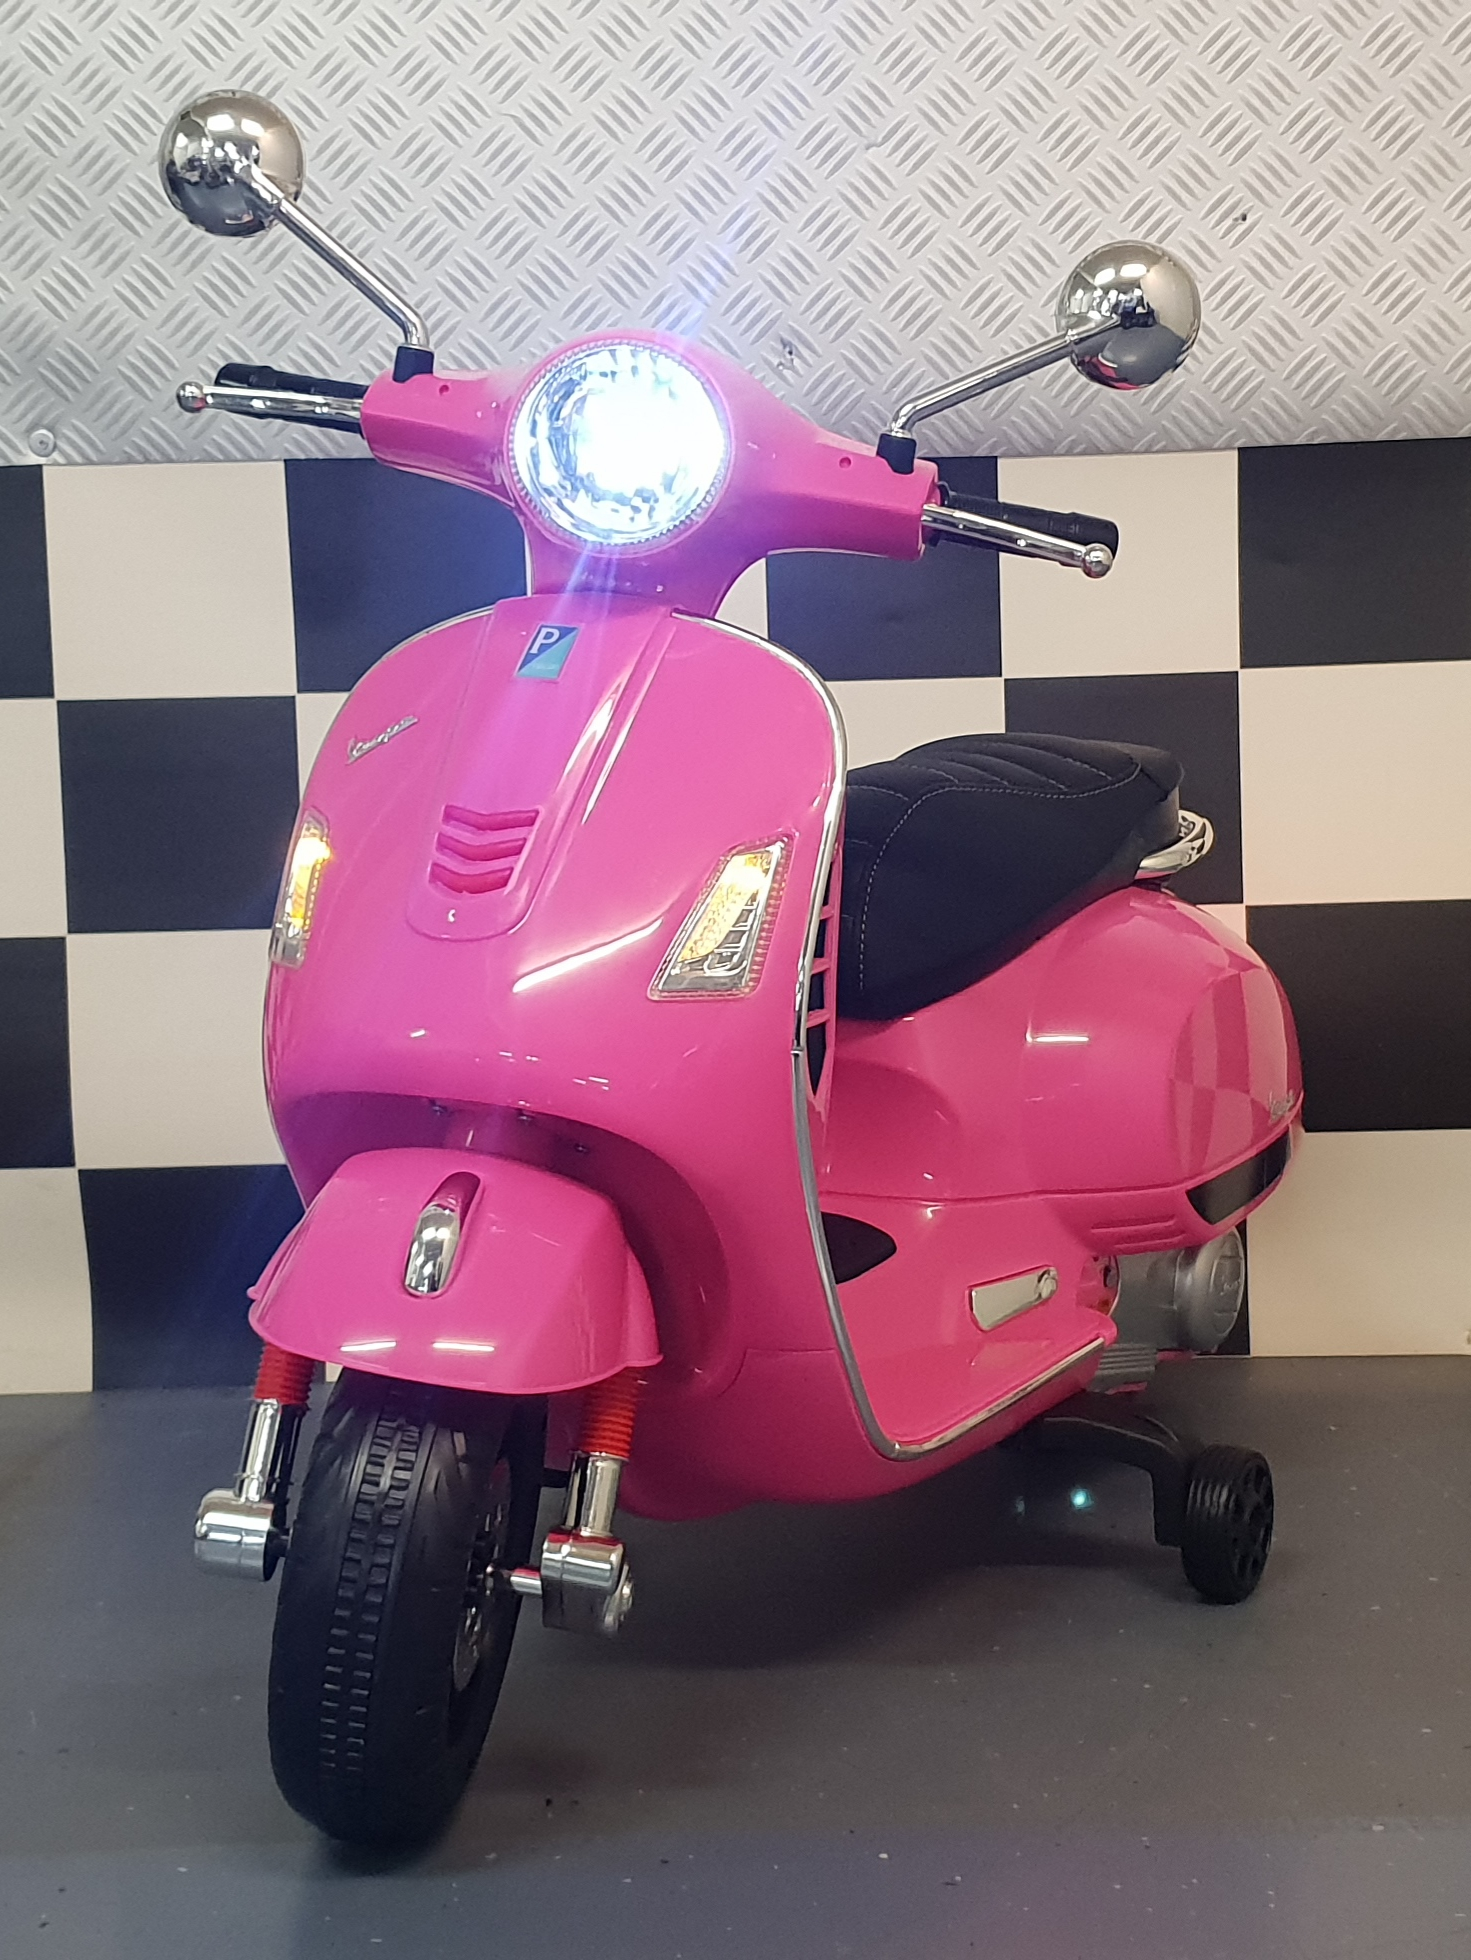 Vespa accu kinderscooter 12 volt Roze